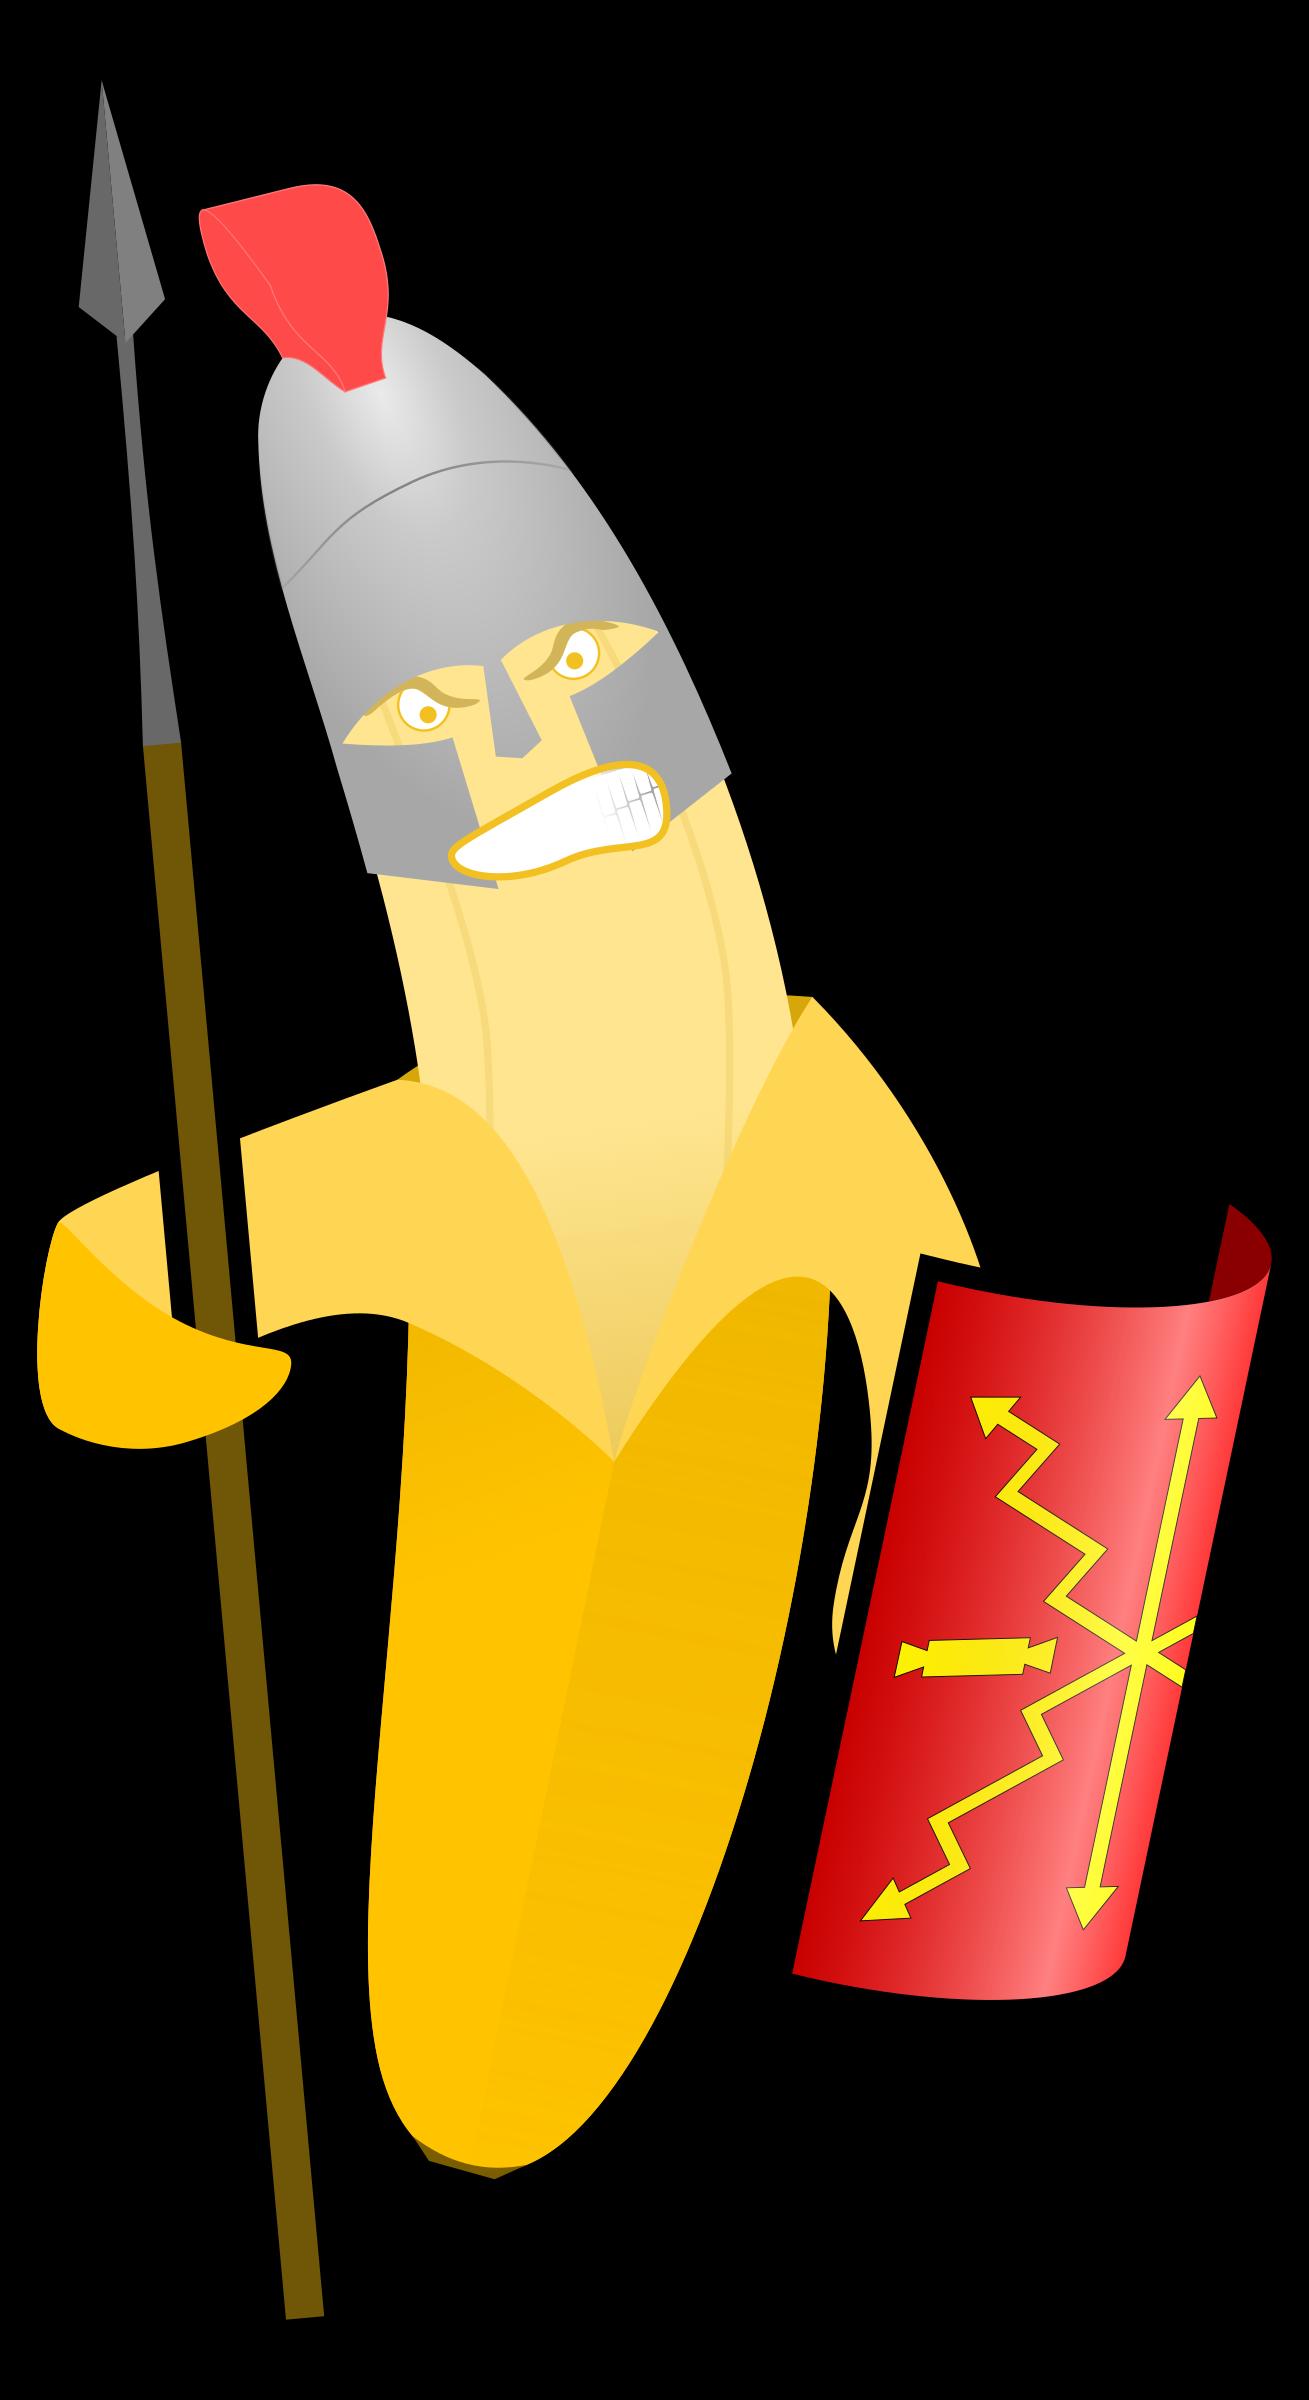 Banana Warrior by jbaldus